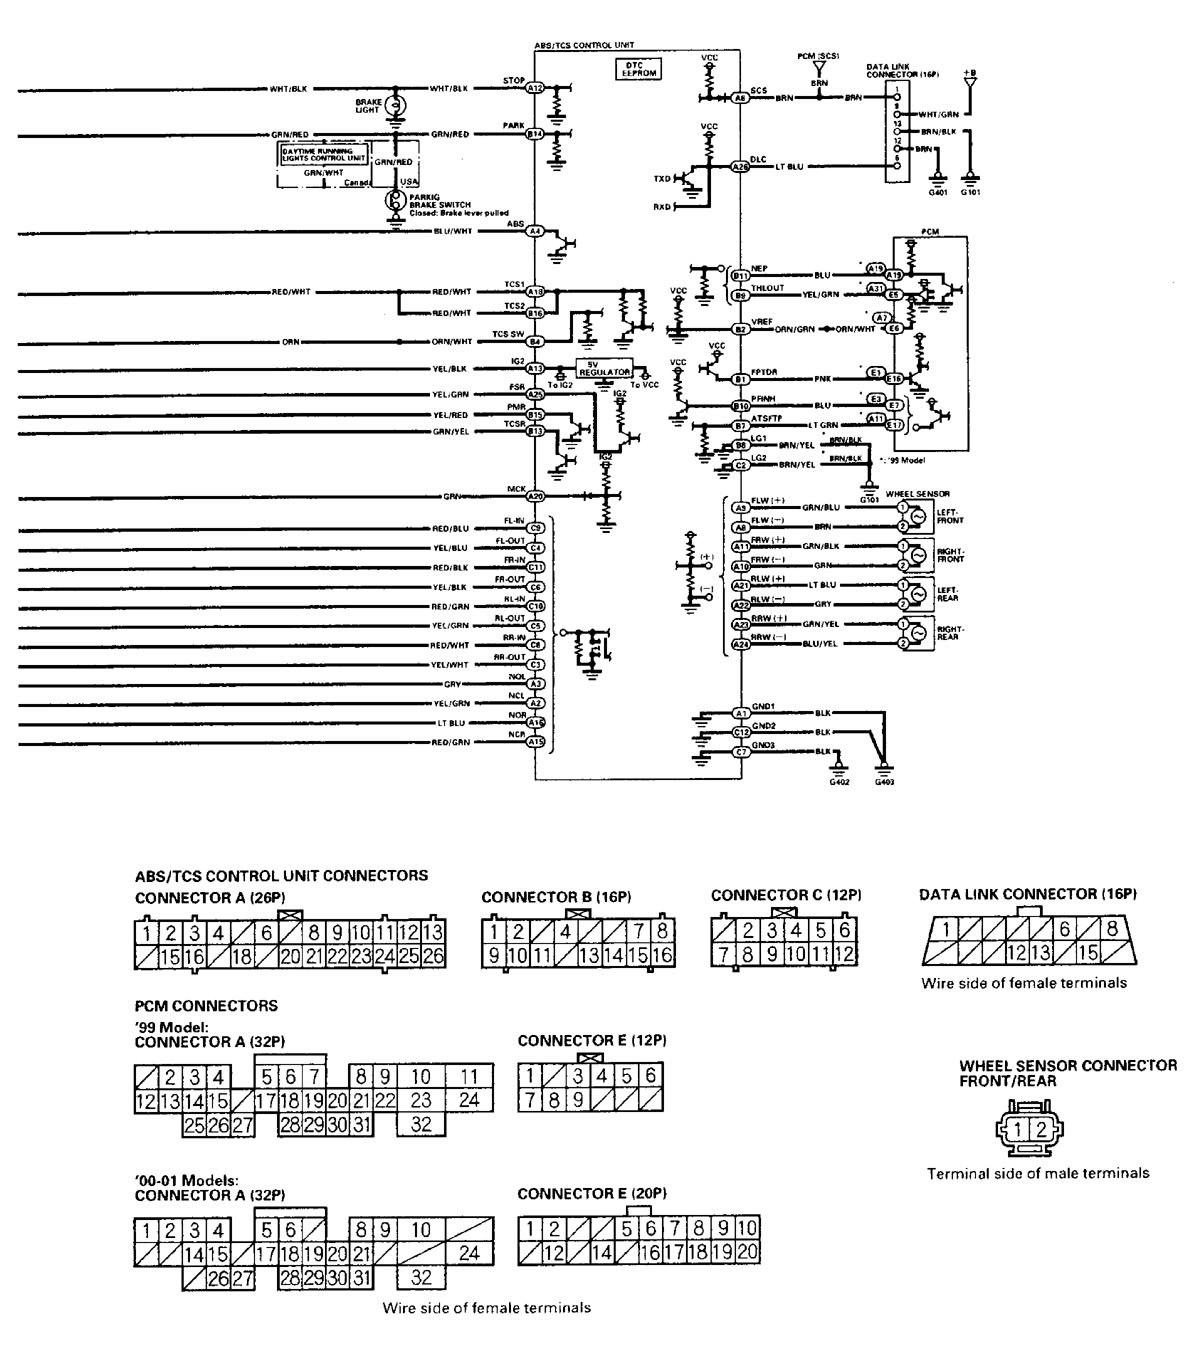 2001 Porsche Boxster Fuse Panel  Fuse Box Location On 1997 Dodge Ram 2500